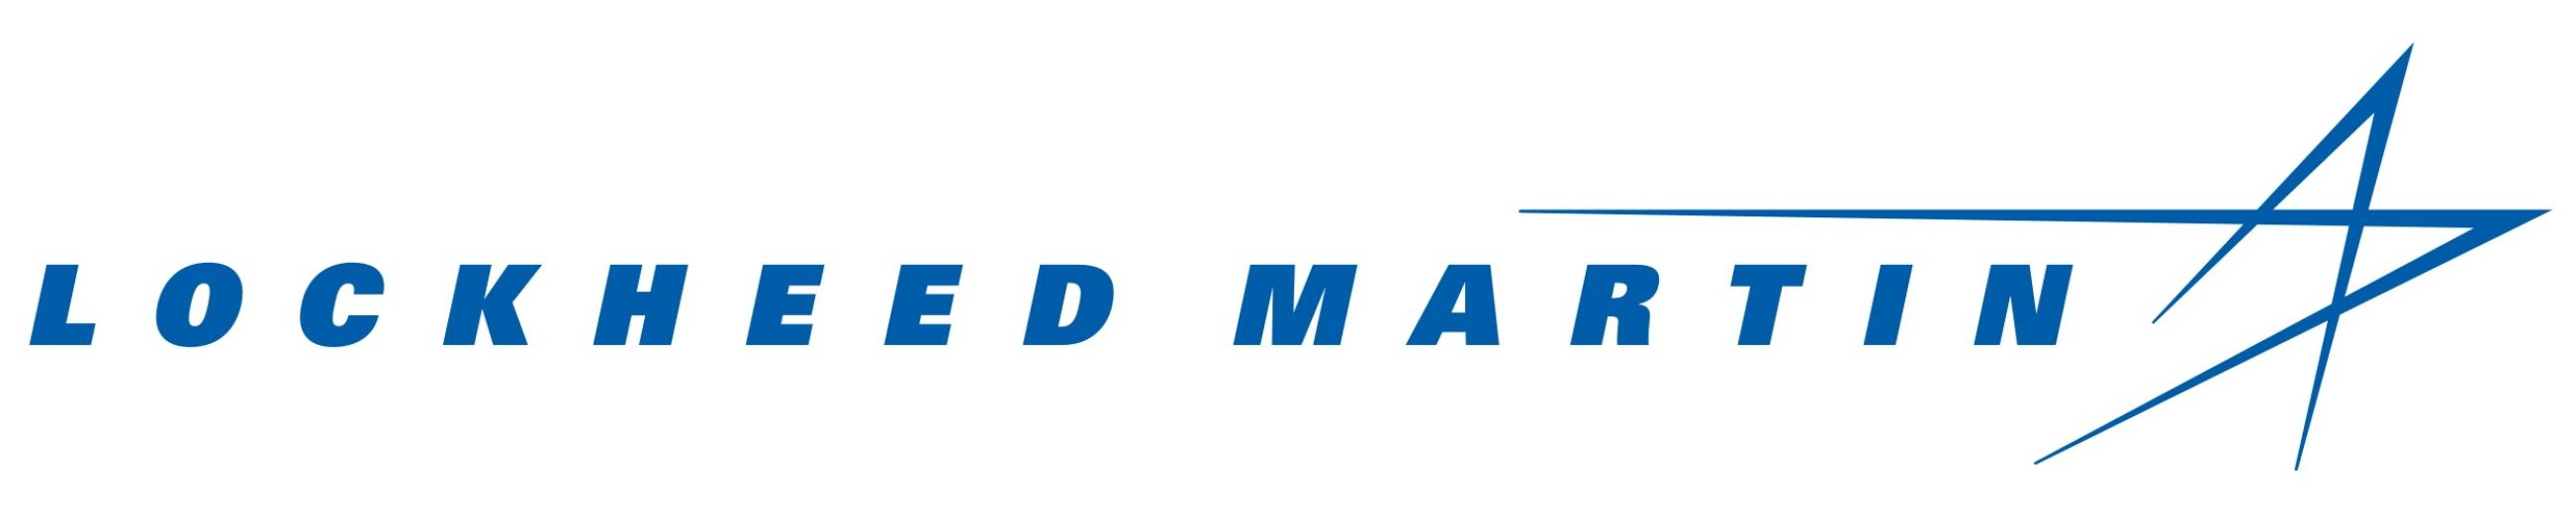 Lockheed Martin Logo [EPS.